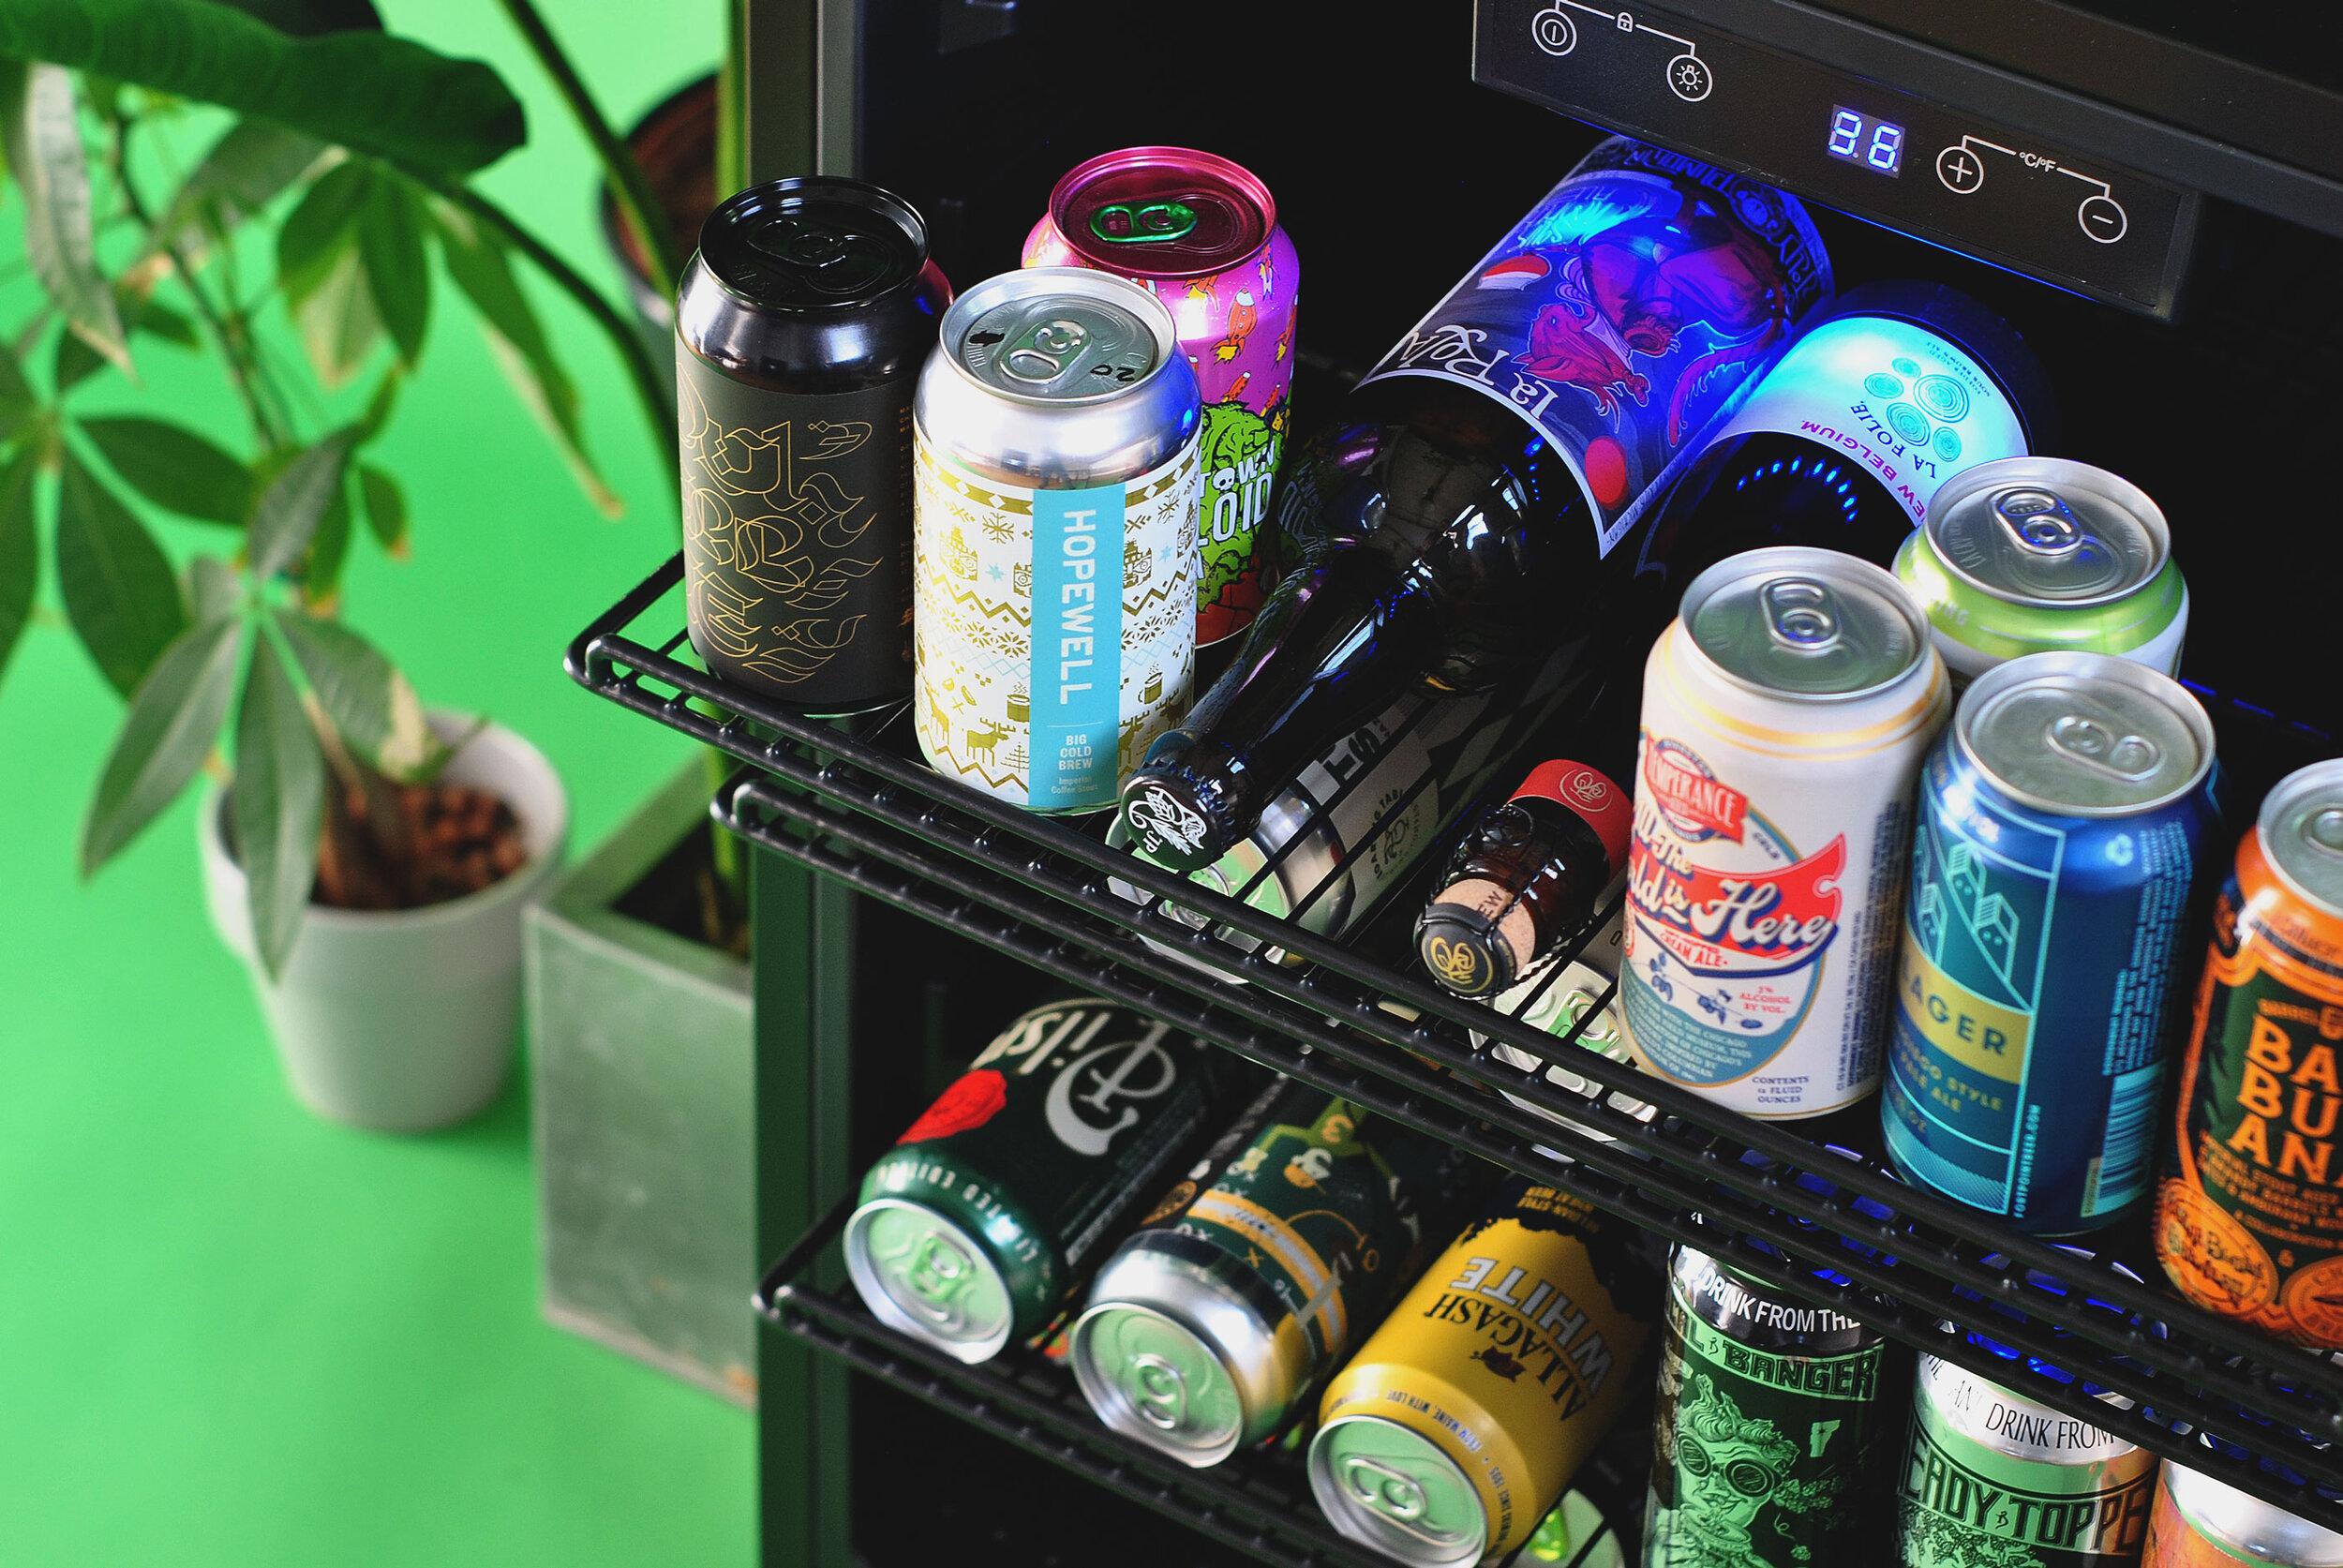 NewAir's Outdoor Fridges Optimize Ideal Beer Temps